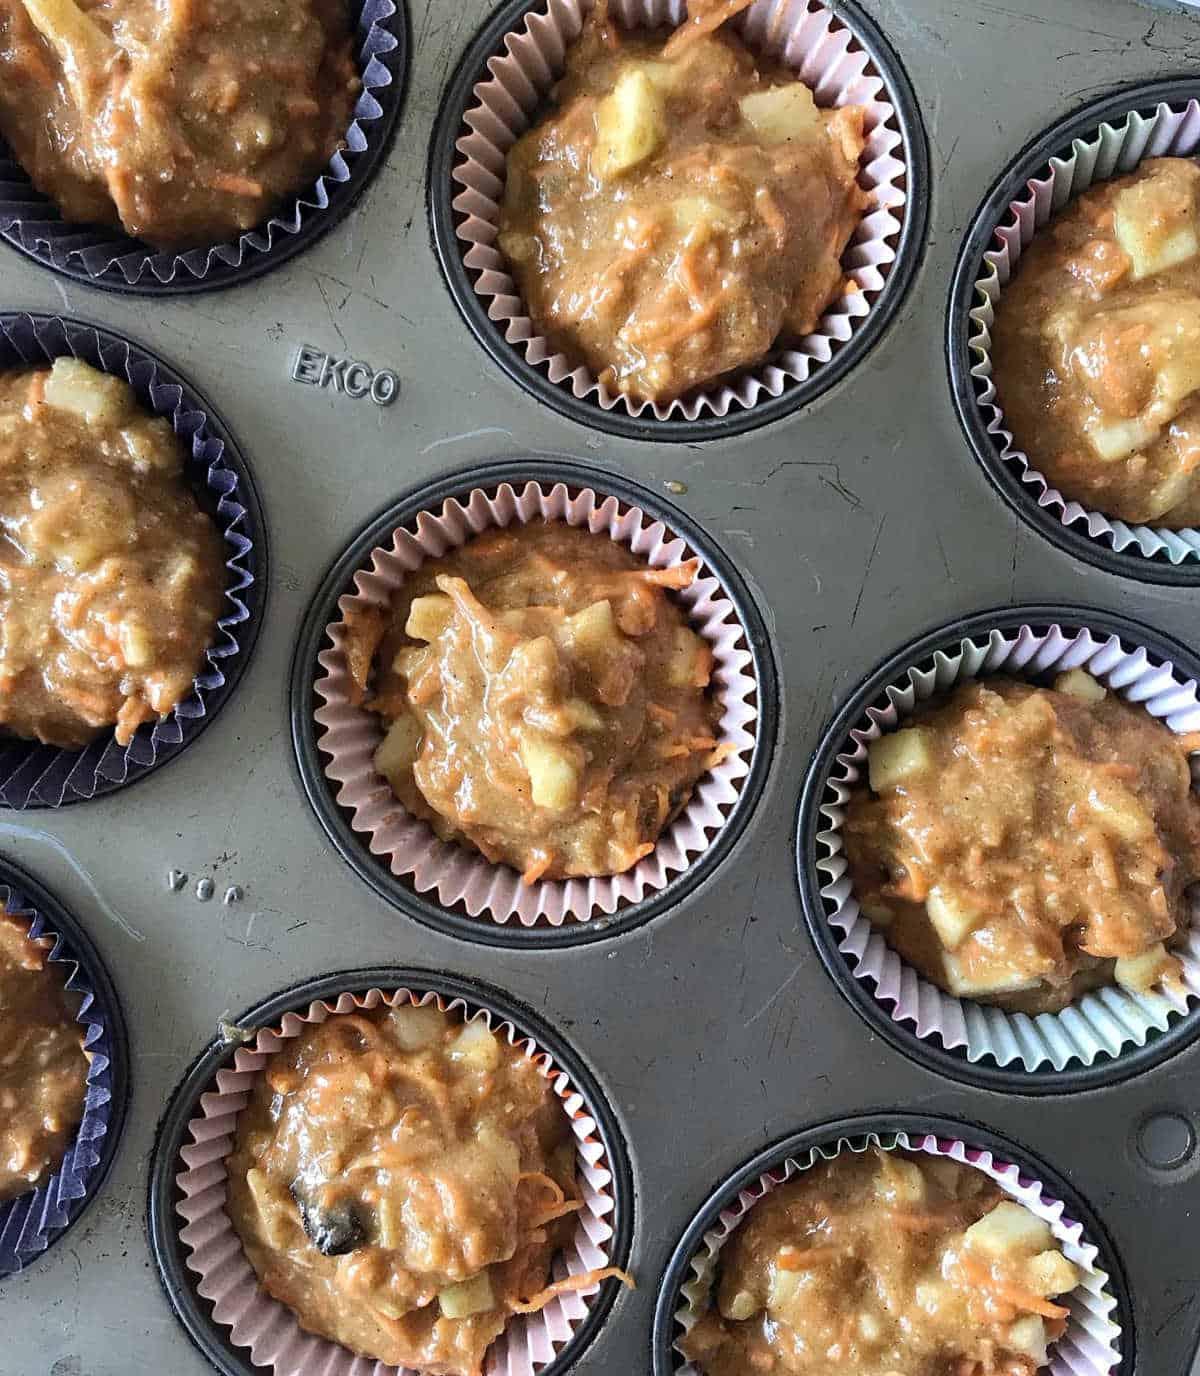 Unbaked muffins in grey metal pan